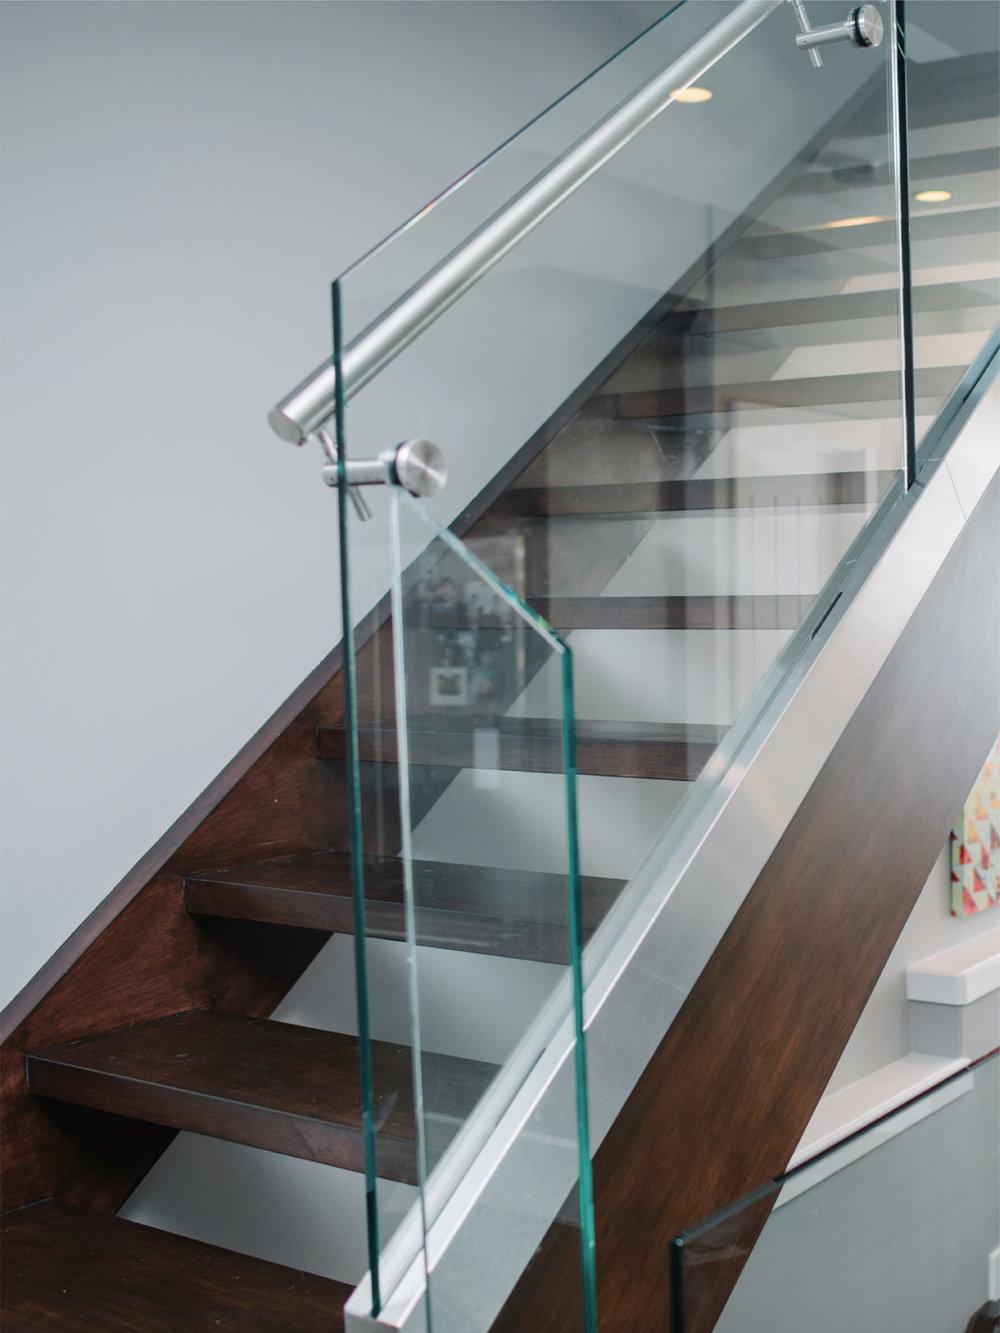 q-design-interior-design-calgary-swell-yyc-graphic-design-03.jpg